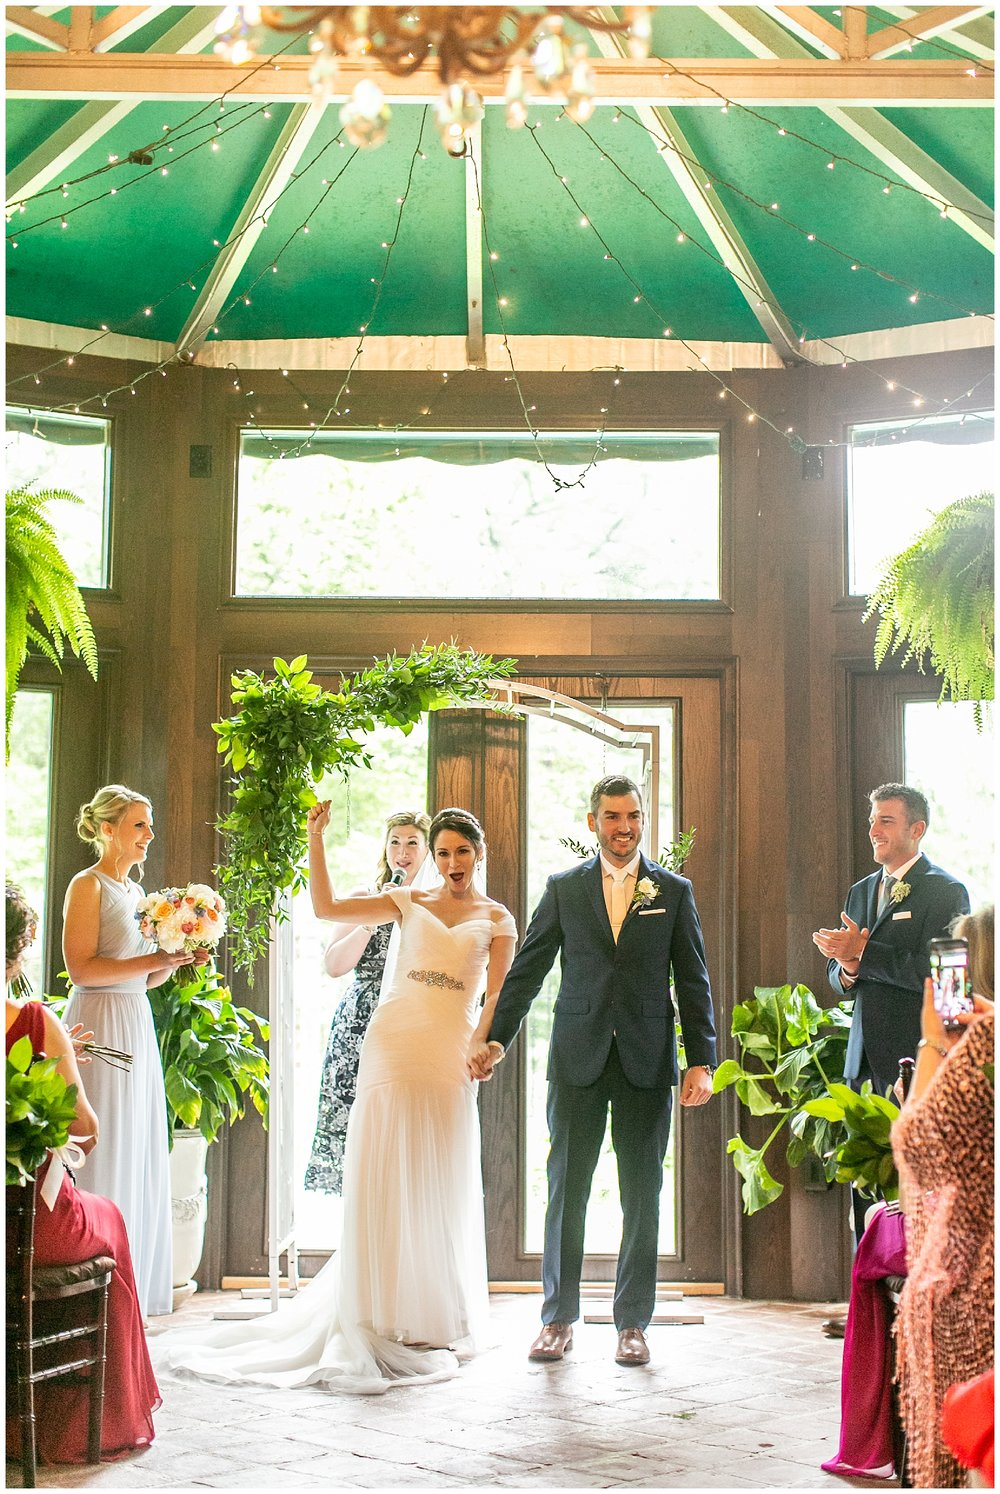 Ashley + Kevin Gramercy Mansion Rainy Day Baltimore Wedding Living Radiant Photography photos_0052.jpg